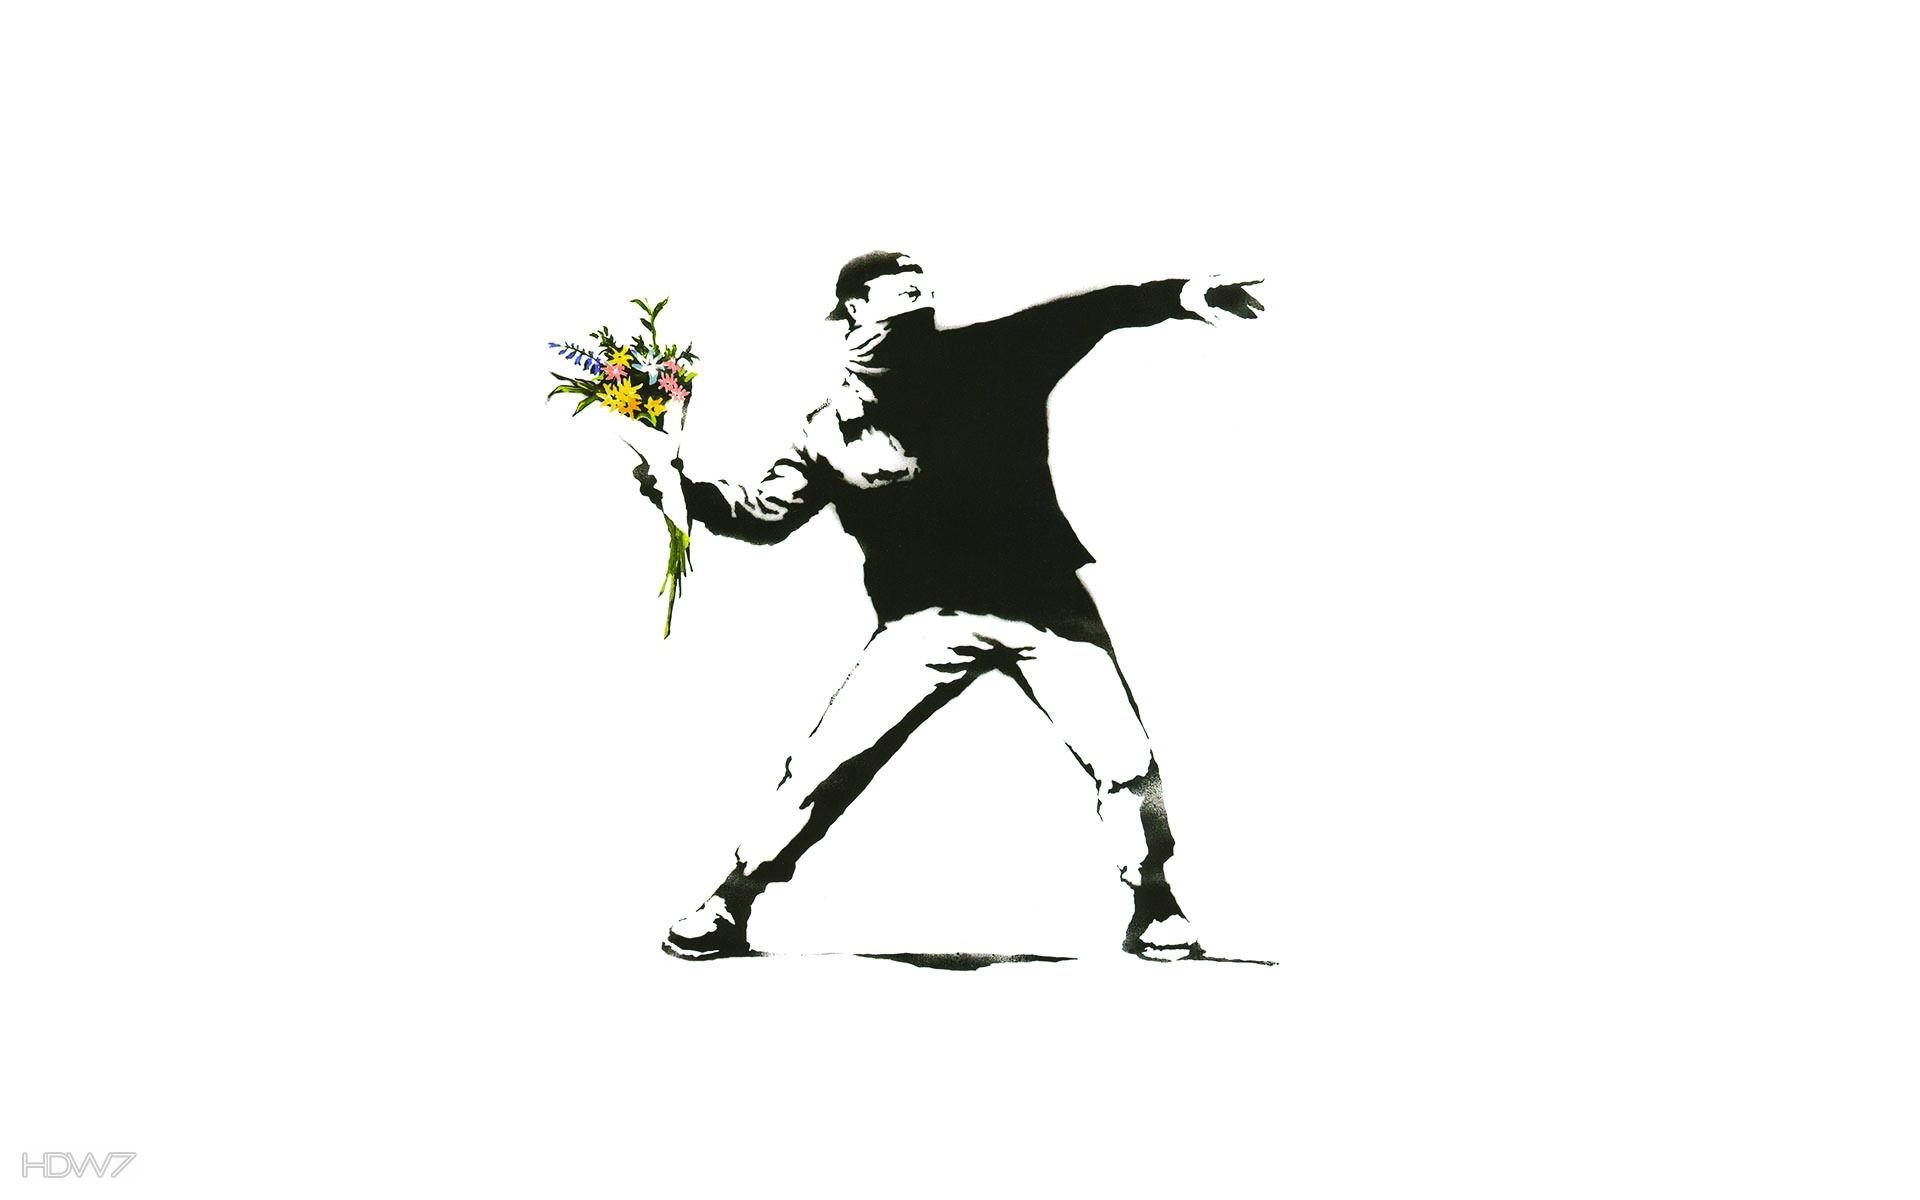 flower thrower banksy wallpaper